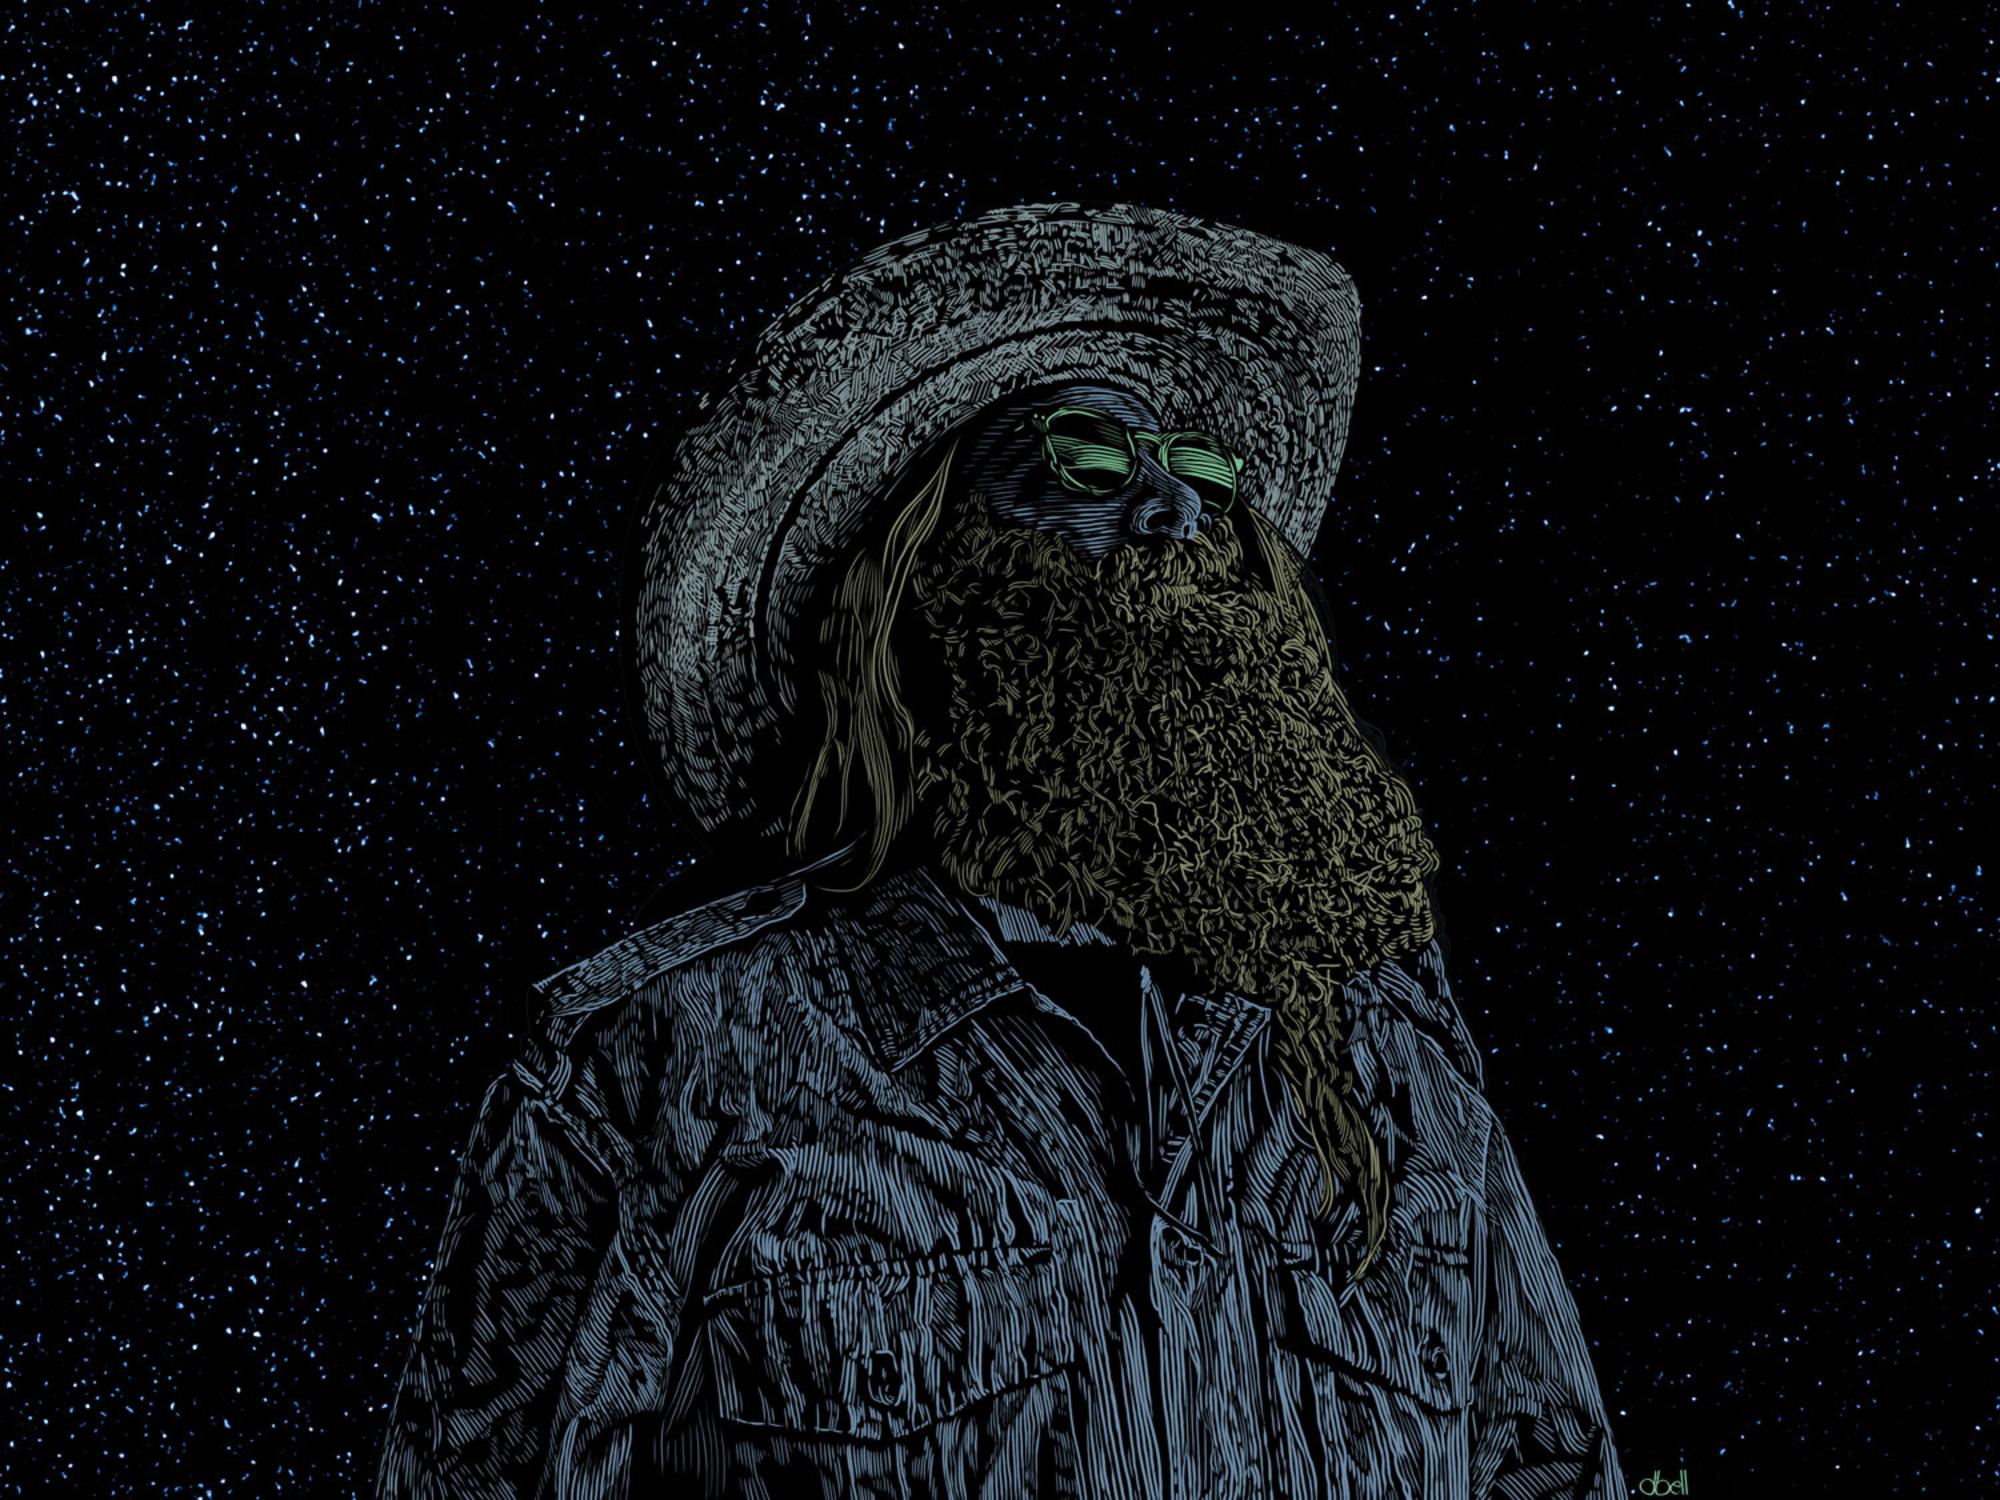 Night Watcher Artwork by Douglas Bell